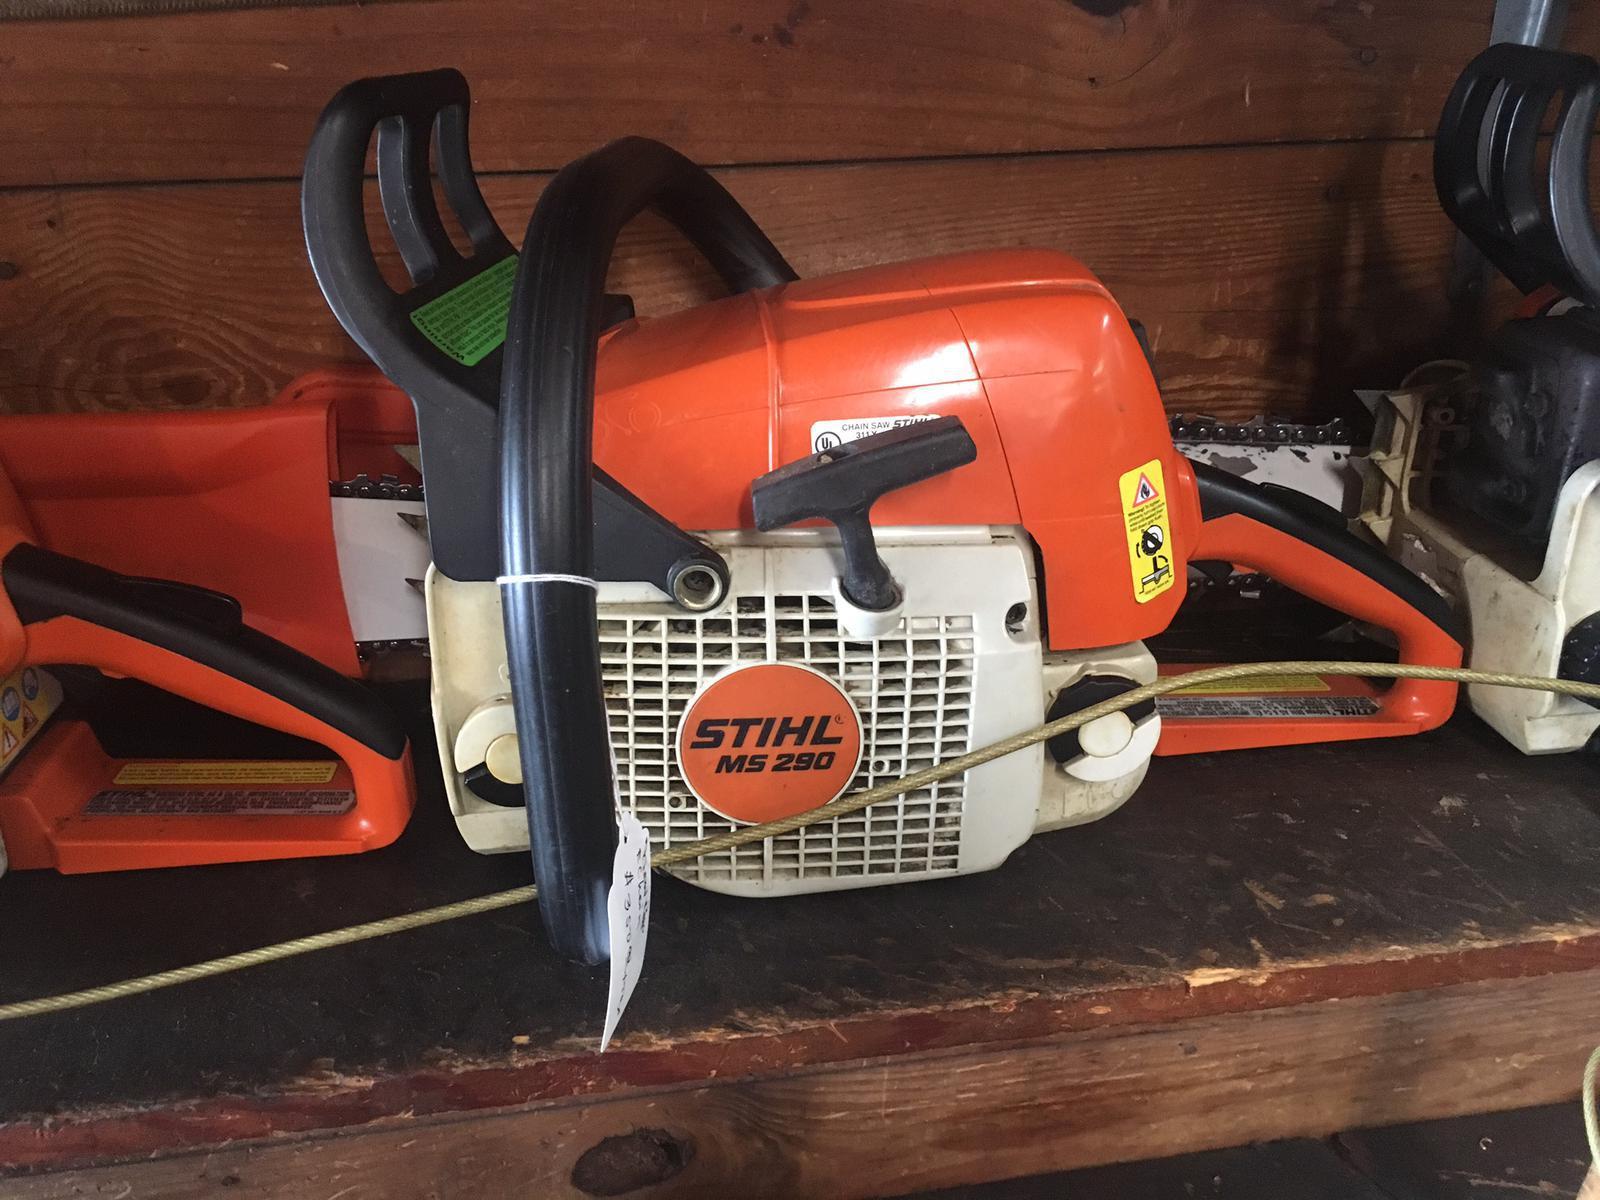 hight resolution of 2010 stihl ms 290 farm boss chain saw for sale in lynn in polley farm service inc 765 874 2291